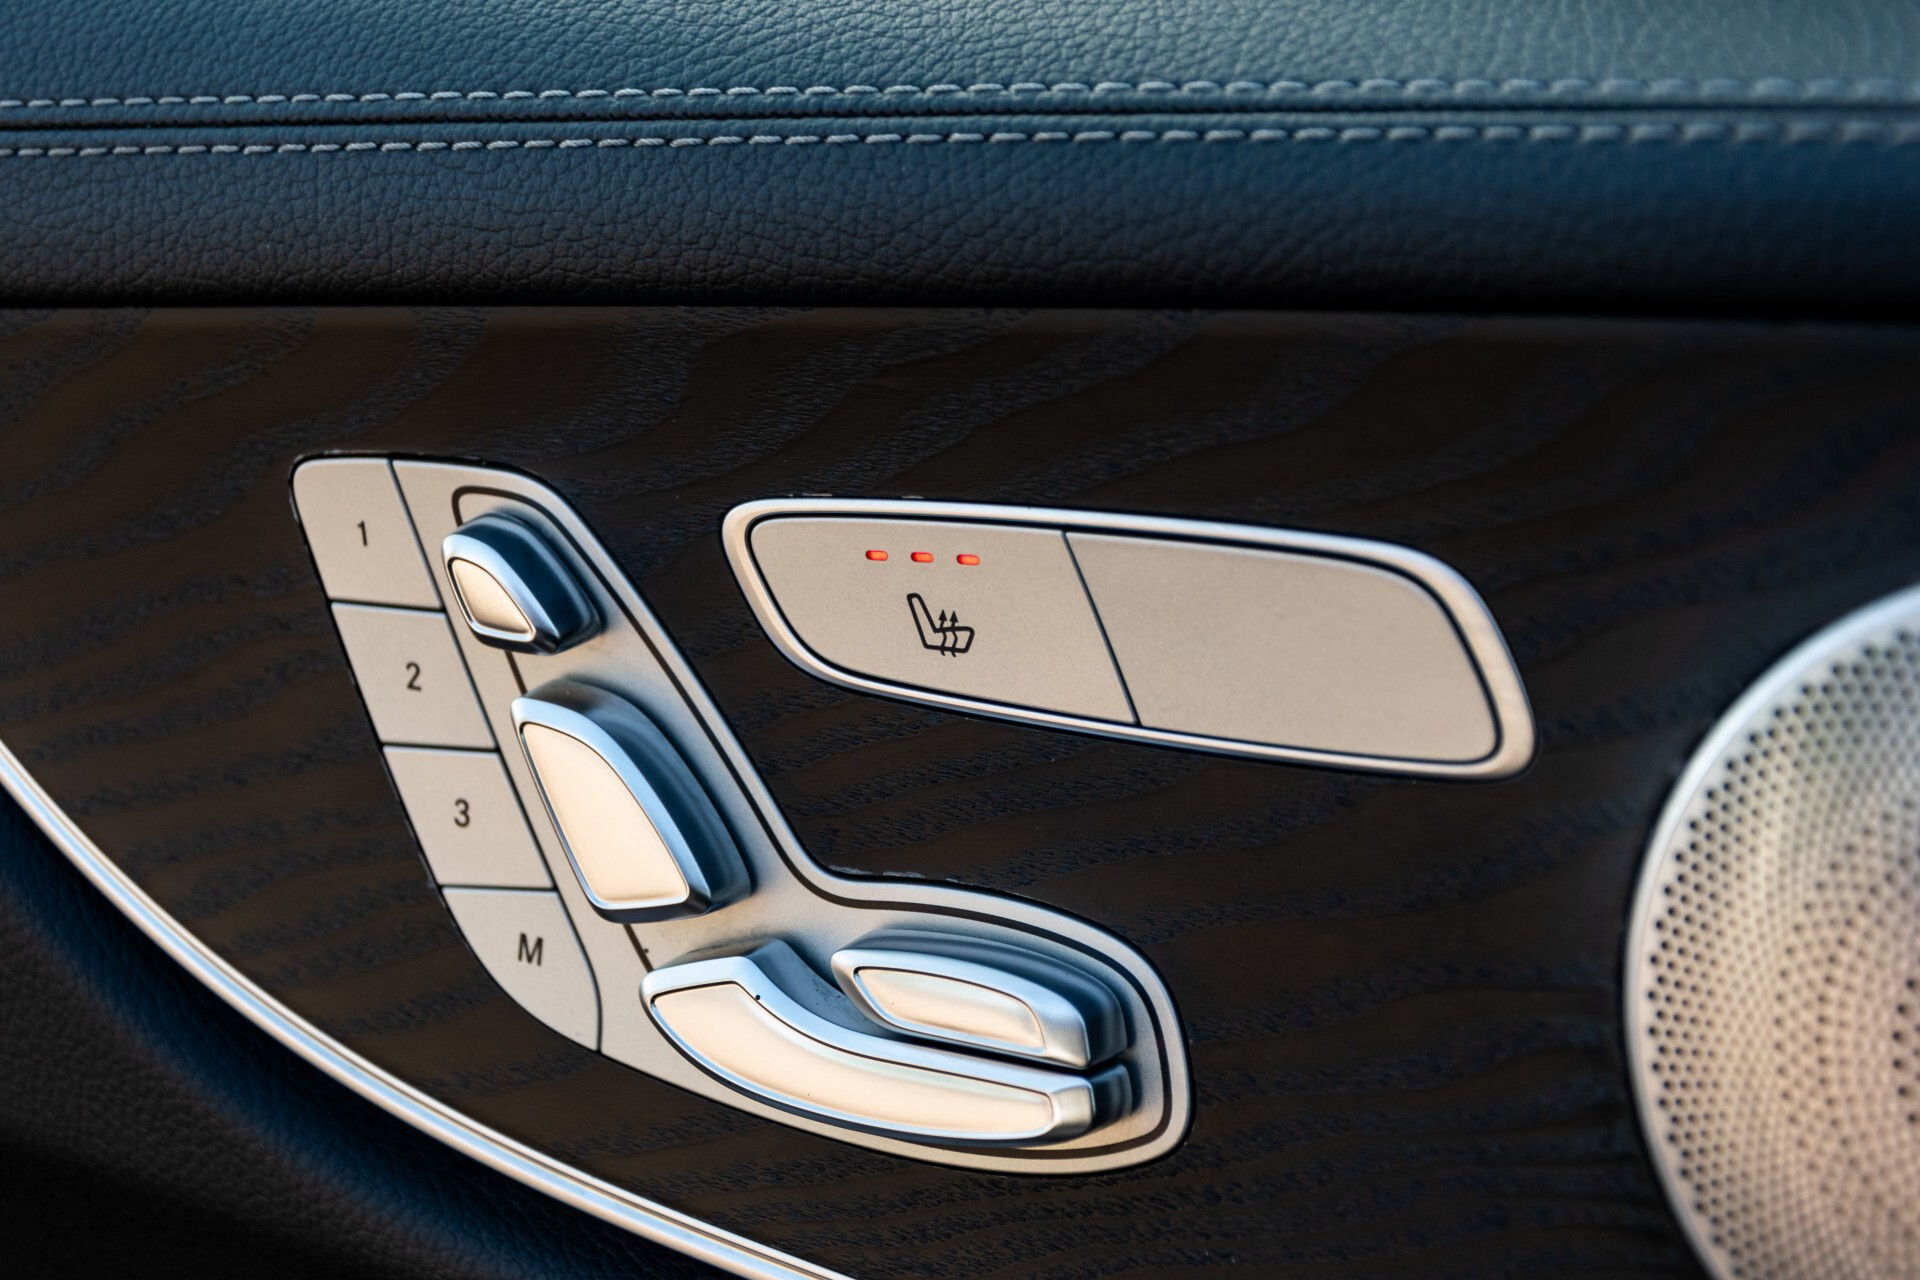 Mercedes-Benz E-Klasse Coupé 300 AMG Panorama/Rij-assist/Keyless/Massage/Memory/HUD/Standkachel/Night Aut9 Foto 36